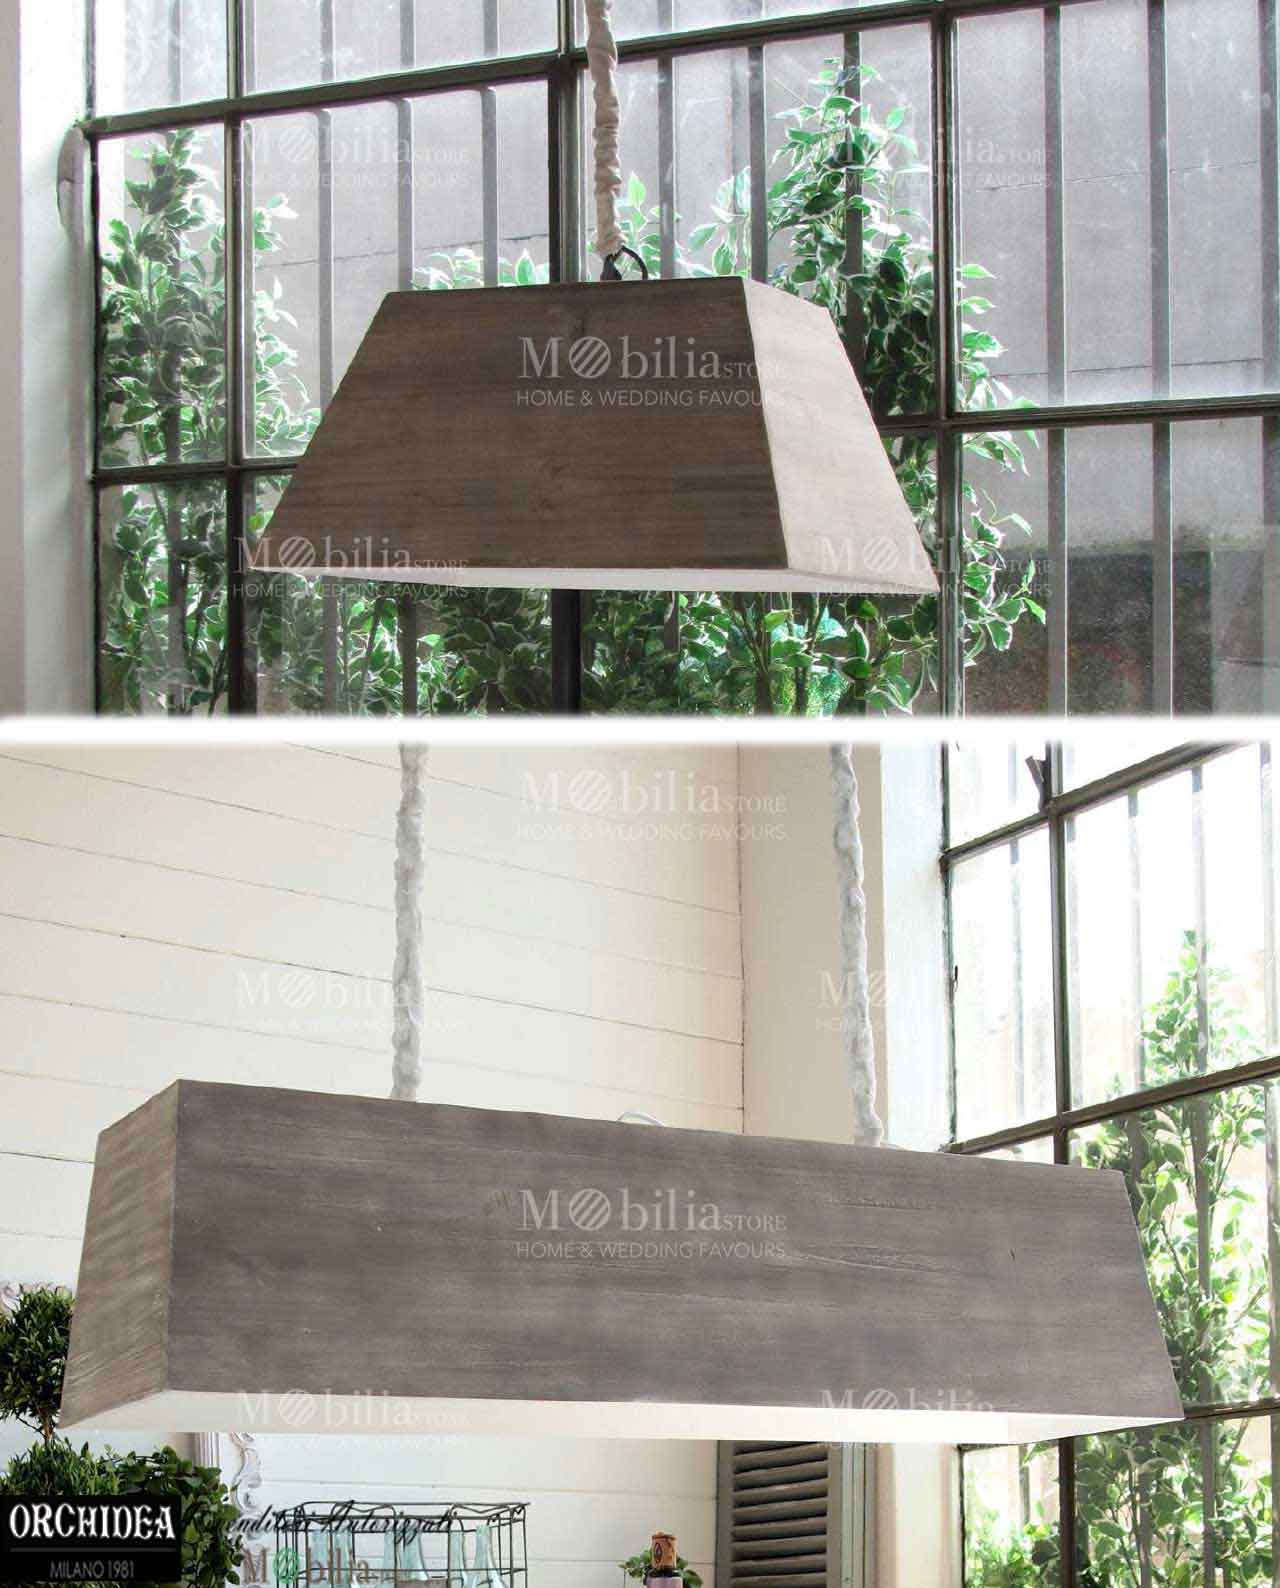 Lampadario sospensione legno stile country - MobiliaStore